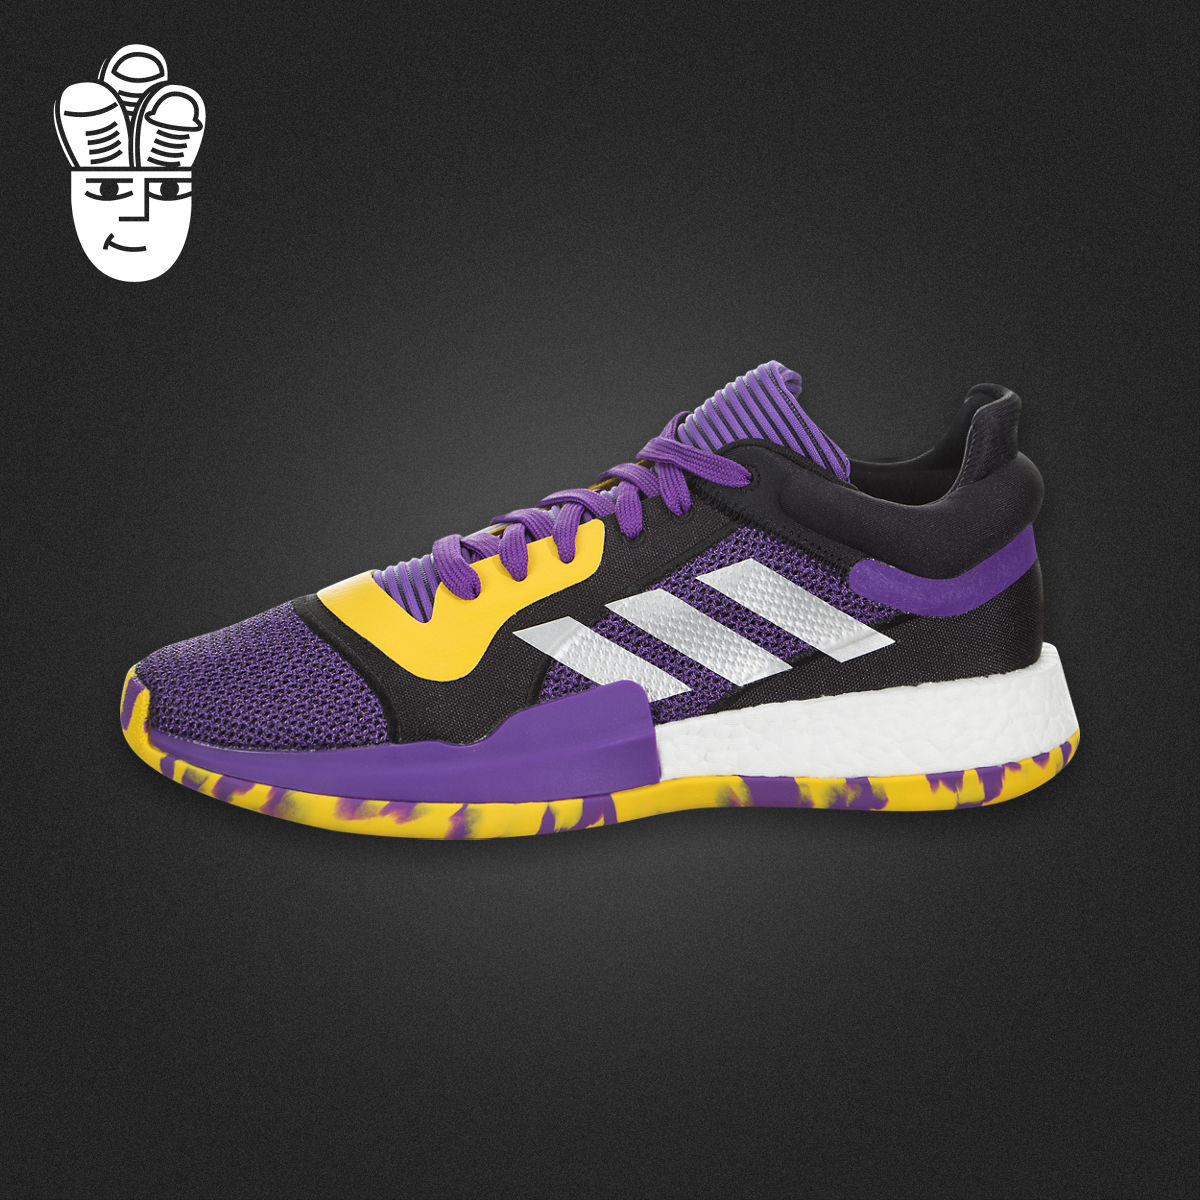 Adidas Marquee Boost Low阿迪达斯男鞋 全新高性能篮球鞋